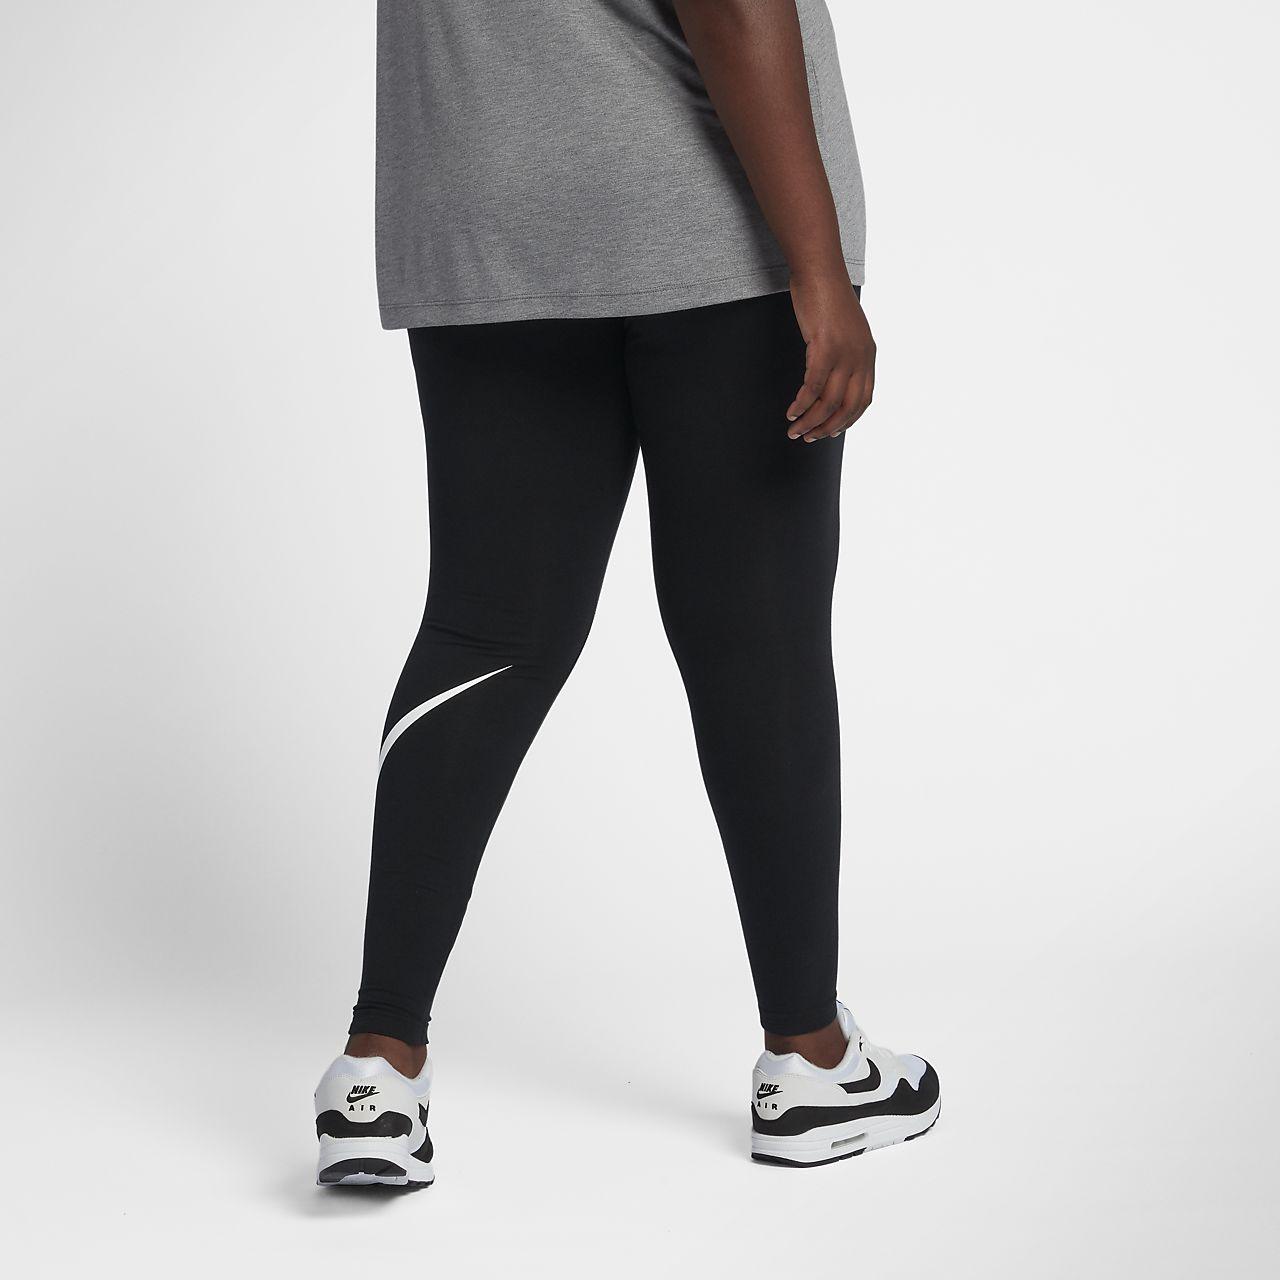 8ea86deae712 Γυναικείο κολάν Nike Sportswear (μεγάλα μεγέθη). Nike.com GR